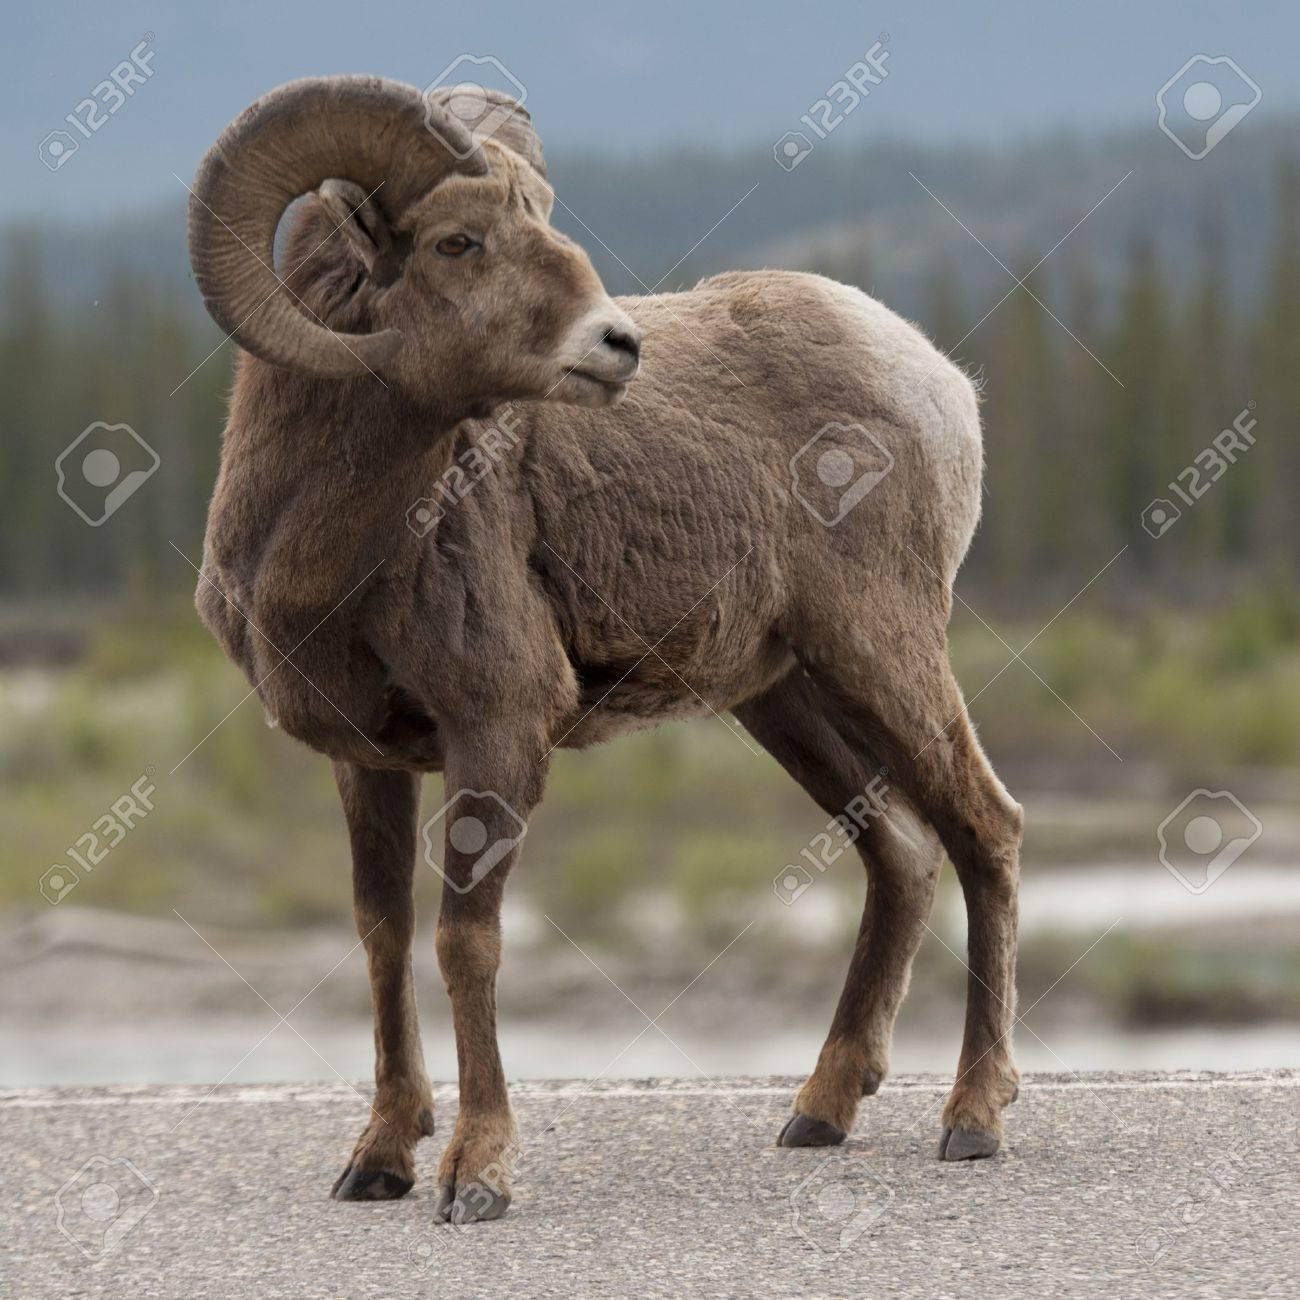 Bighorn sheep (Ovis canadensis), Jasper National Park, Alberta, Canada - 14207549